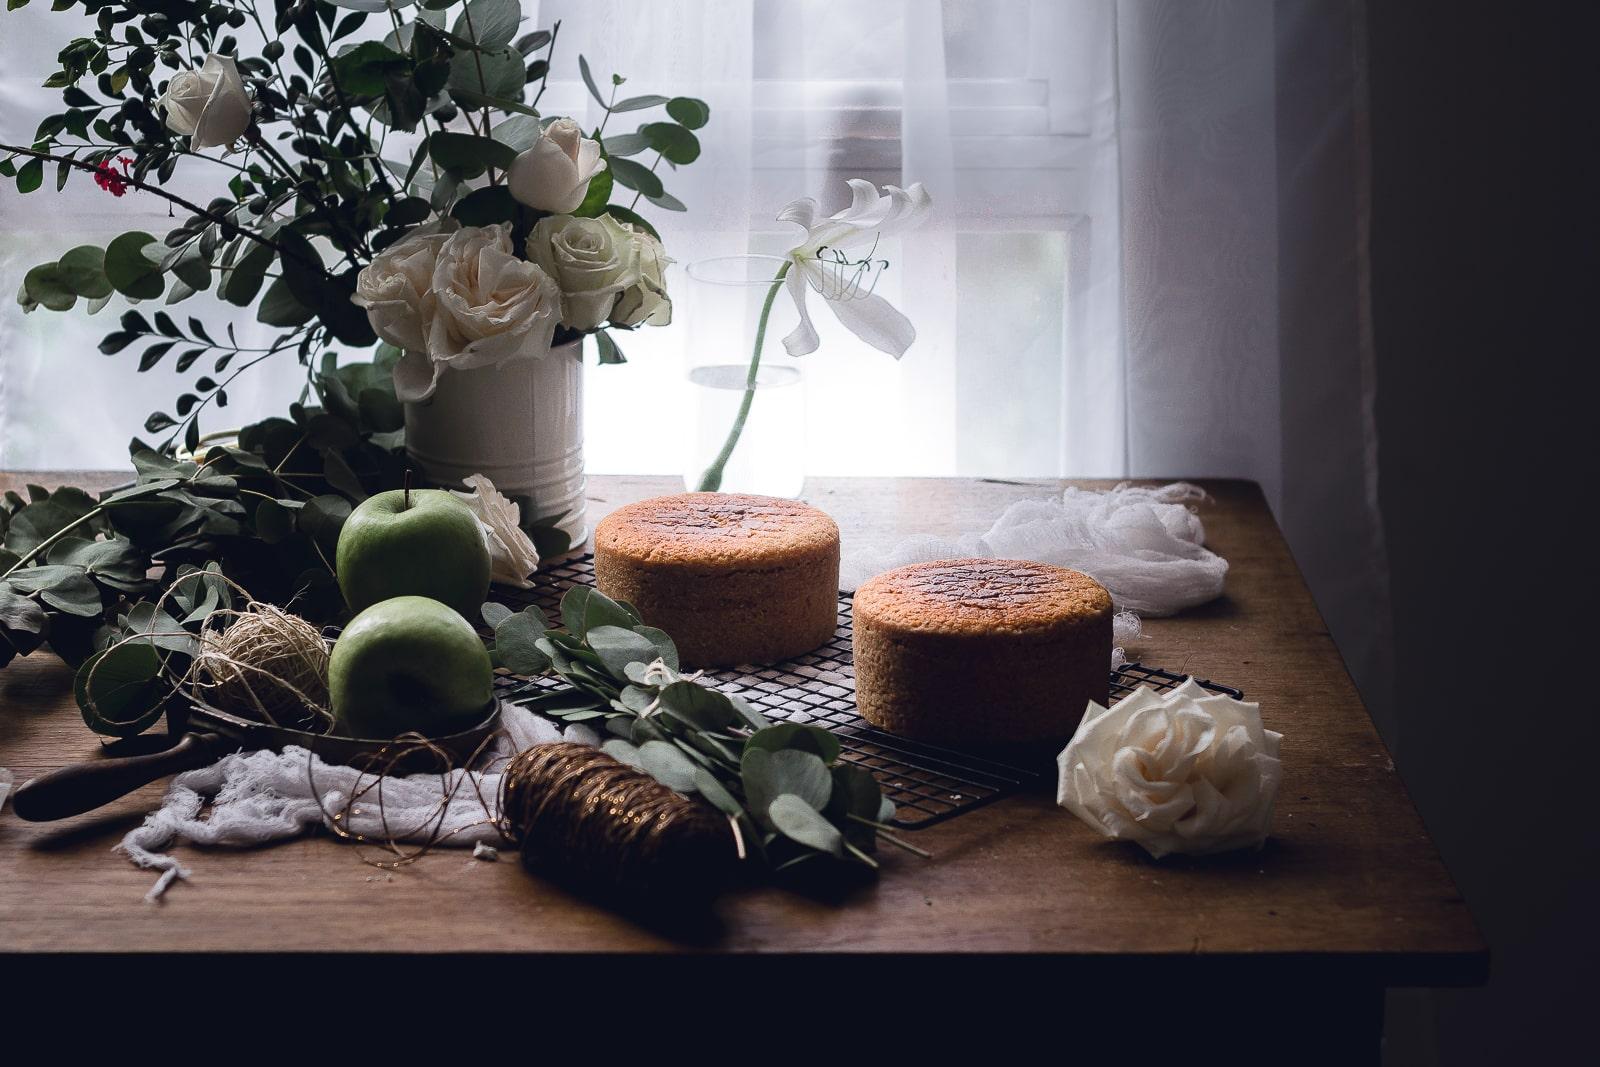 gingerbread-apple-cake-4334